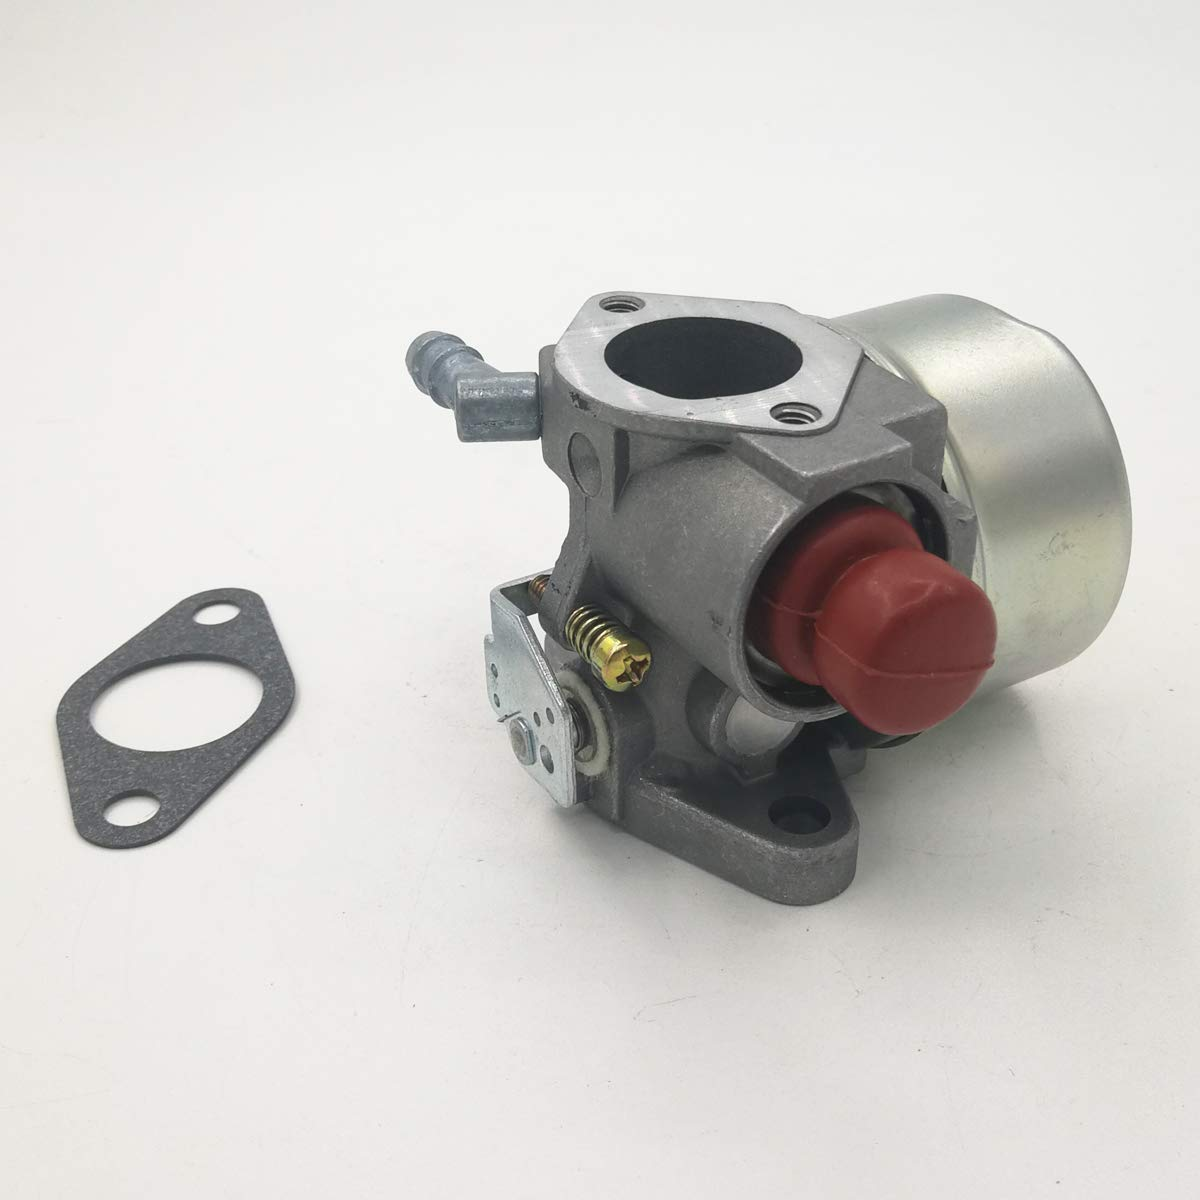 Cancanle Carburador Junta para Tecumseh 640017B 640117 640117B 640104 para OHH45 OHH50 5HP OHV